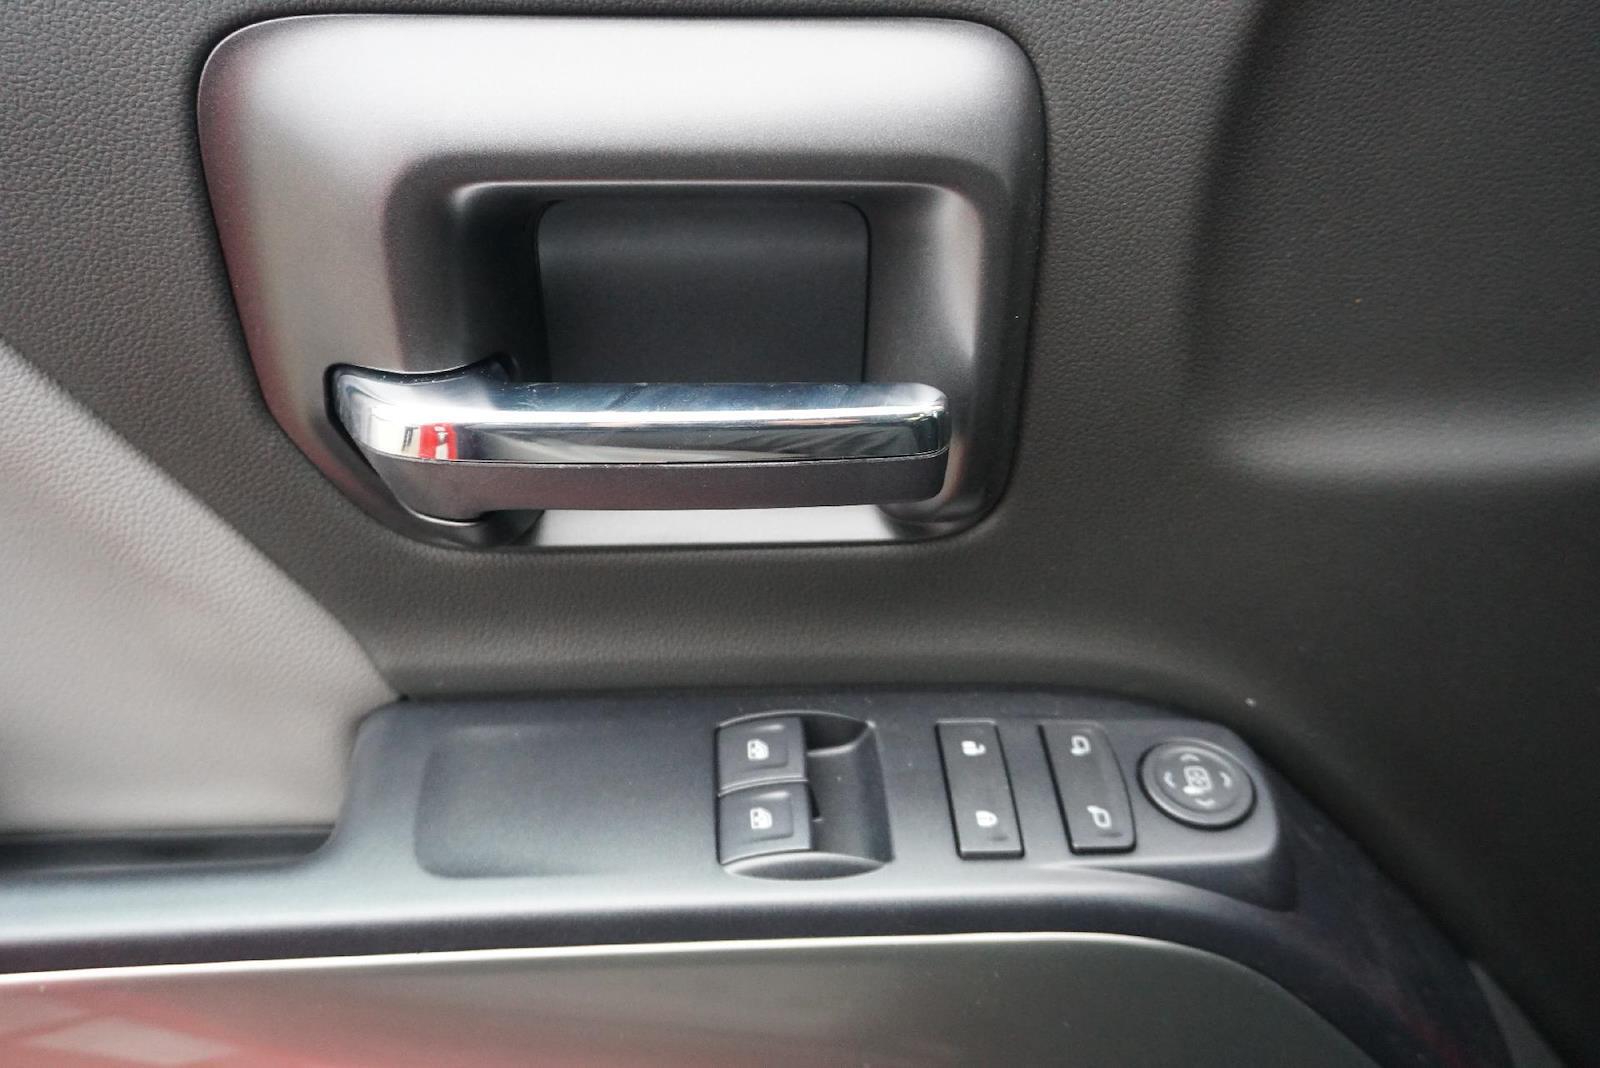 2019 Chevrolet Silverado 5500 Regular Cab DRW 4x2, Rollback Body #91052 - photo 17